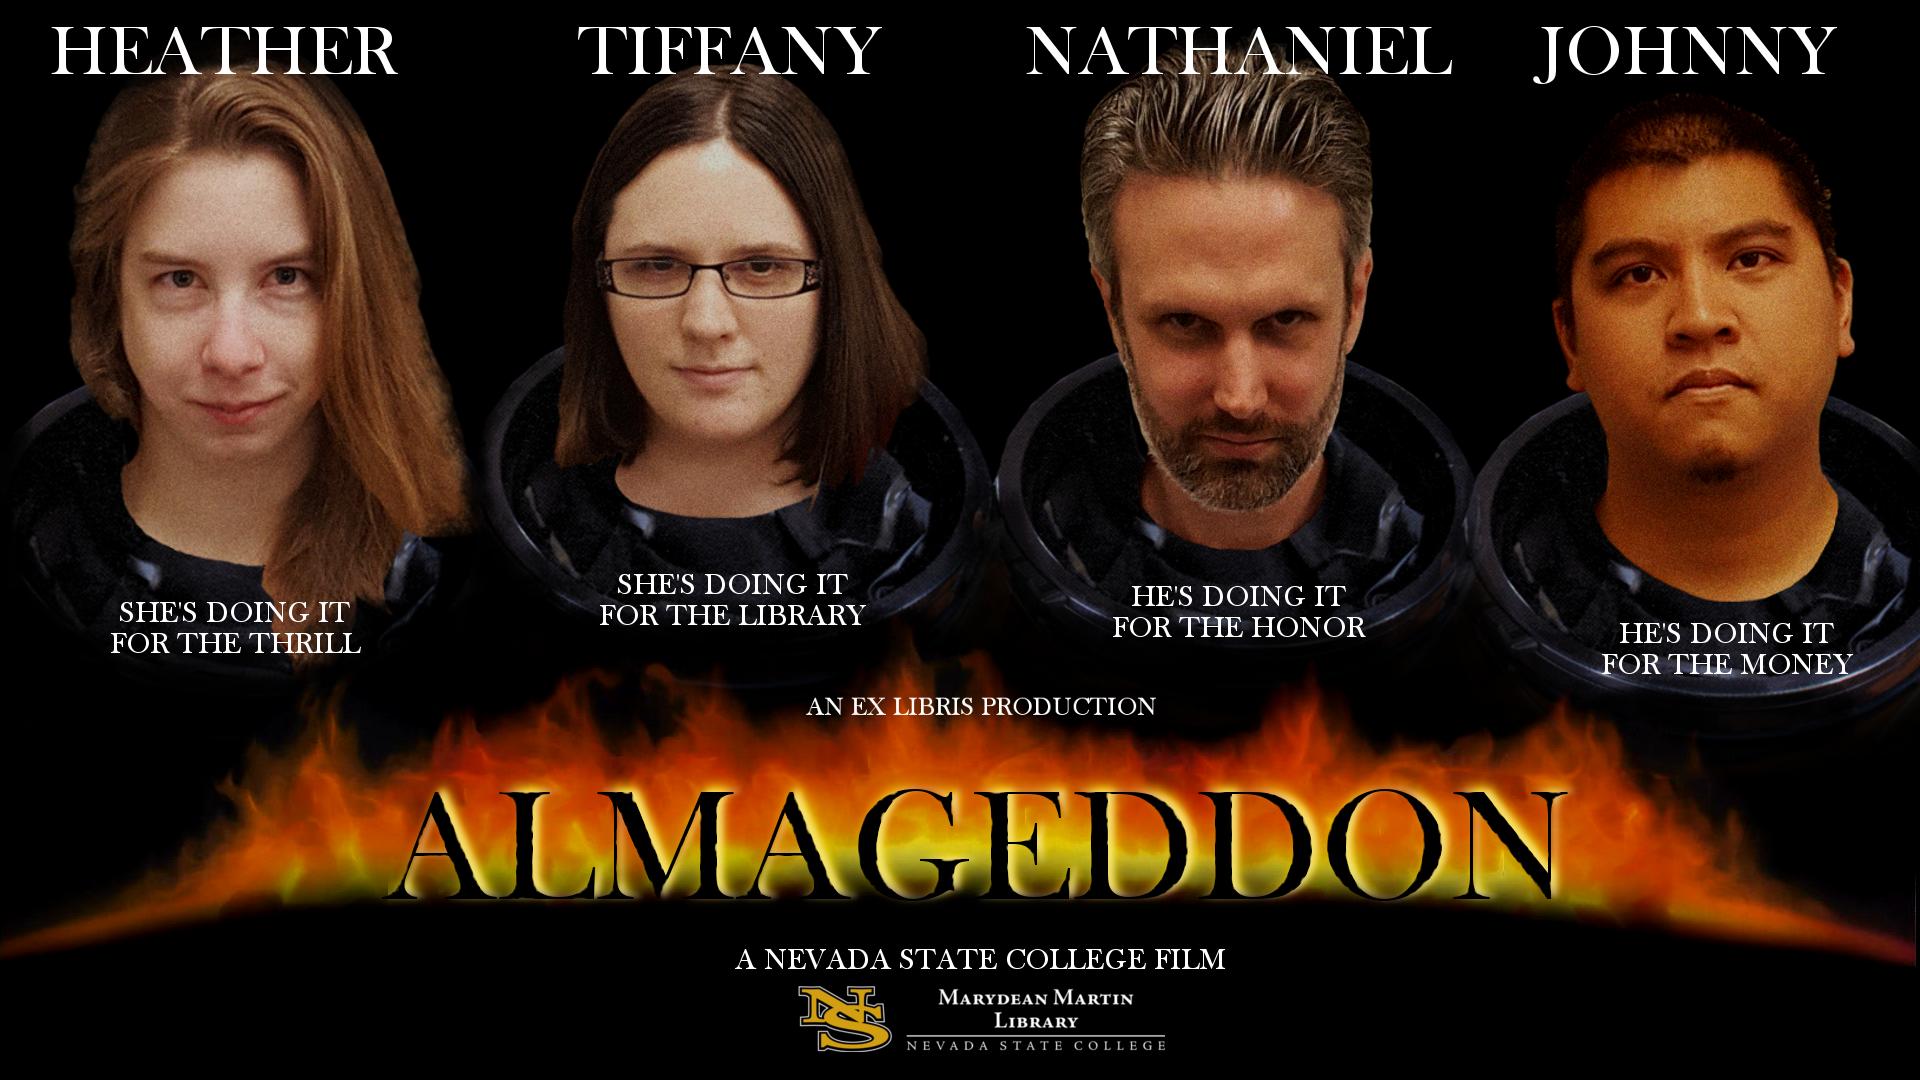 Almageddon - Nevada State College